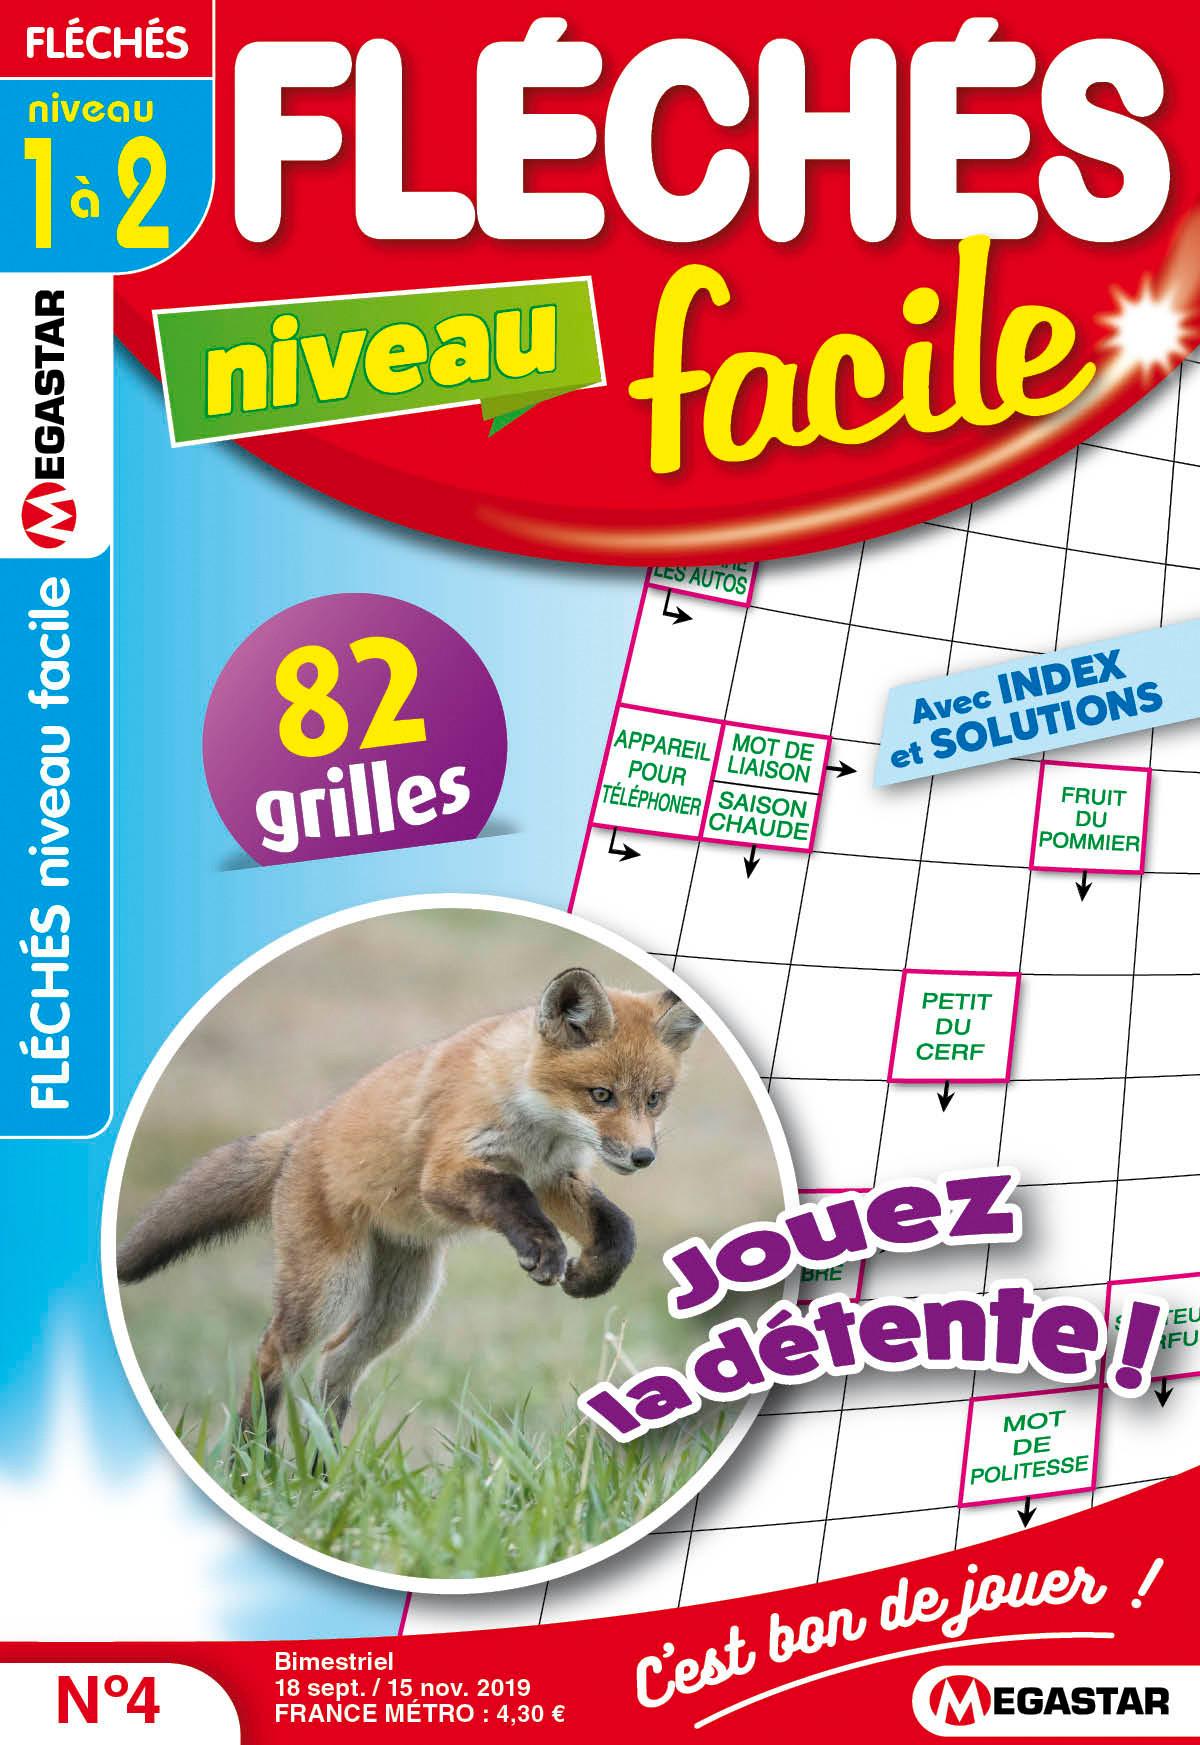 Mots Fleches Faciles Ebook - Clayden Organic Chemistry Book à Definition Mot Fleches Gratuit